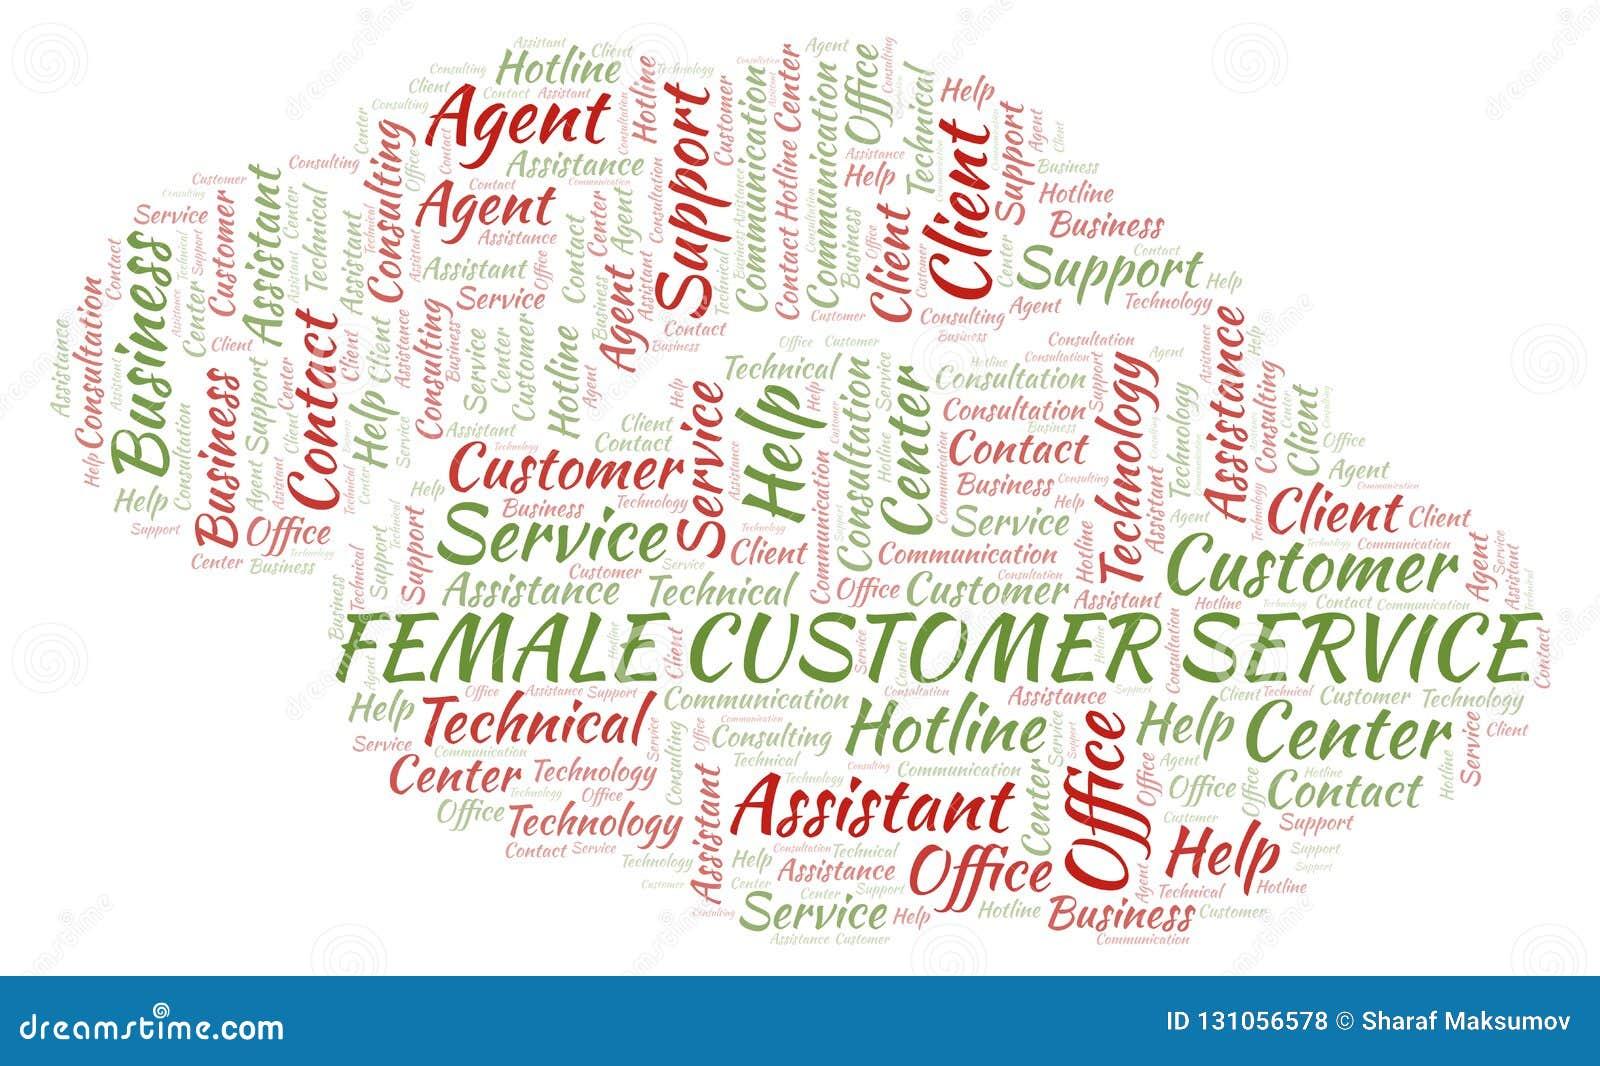 Female Customer Service Word Cloud  Stock Illustration